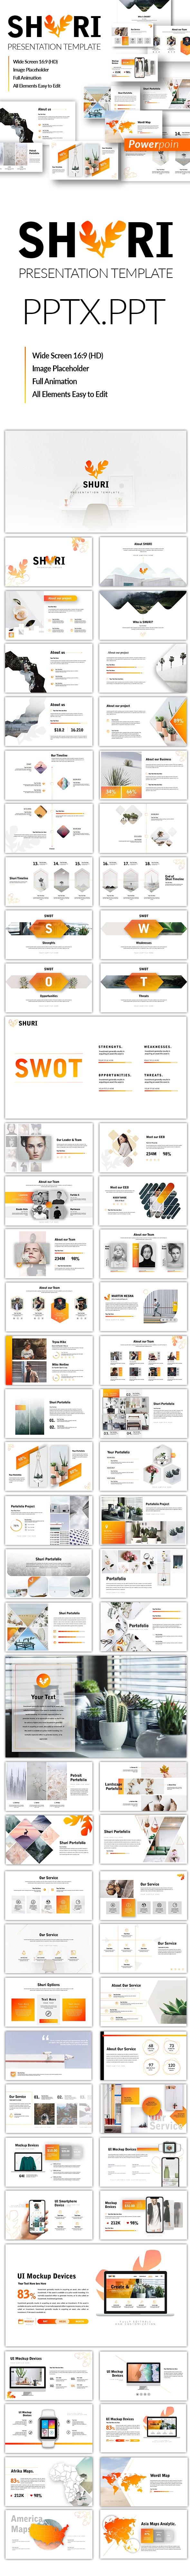 Shuri Business Template - Business PowerPoint Templates